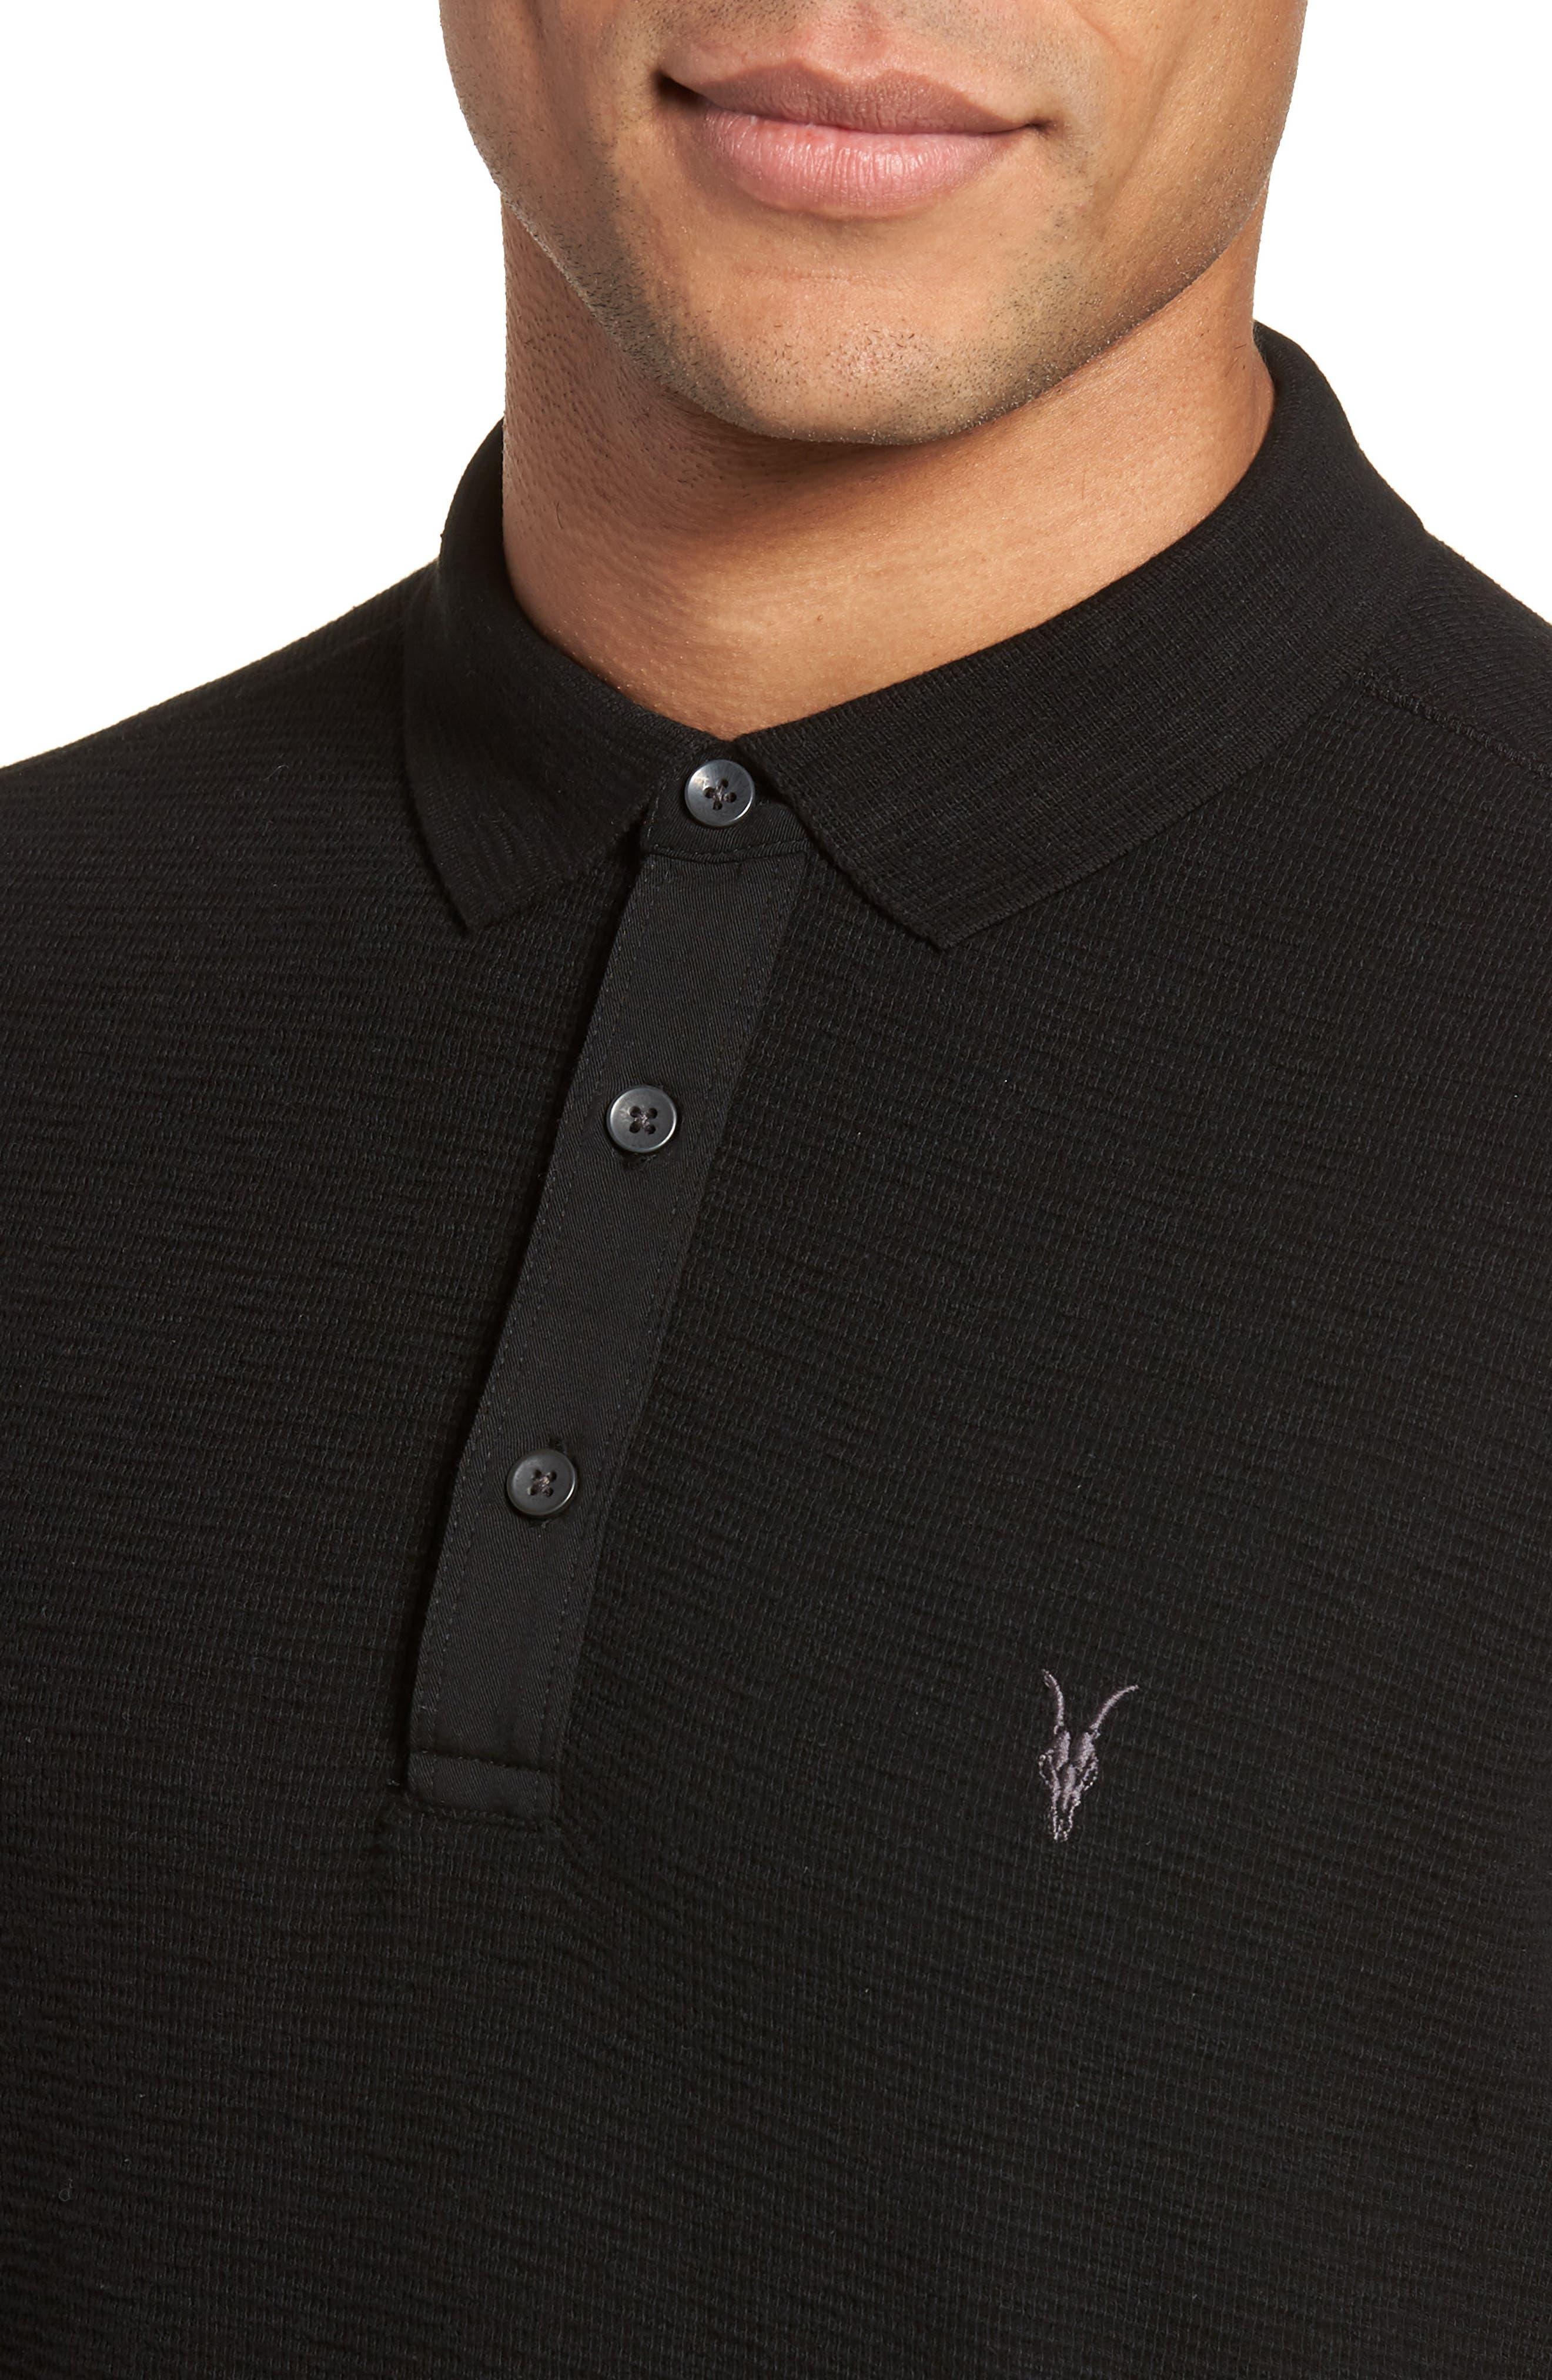 Clash Regular Fit Cotton Polo Shirt,                             Alternate thumbnail 4, color,                             003